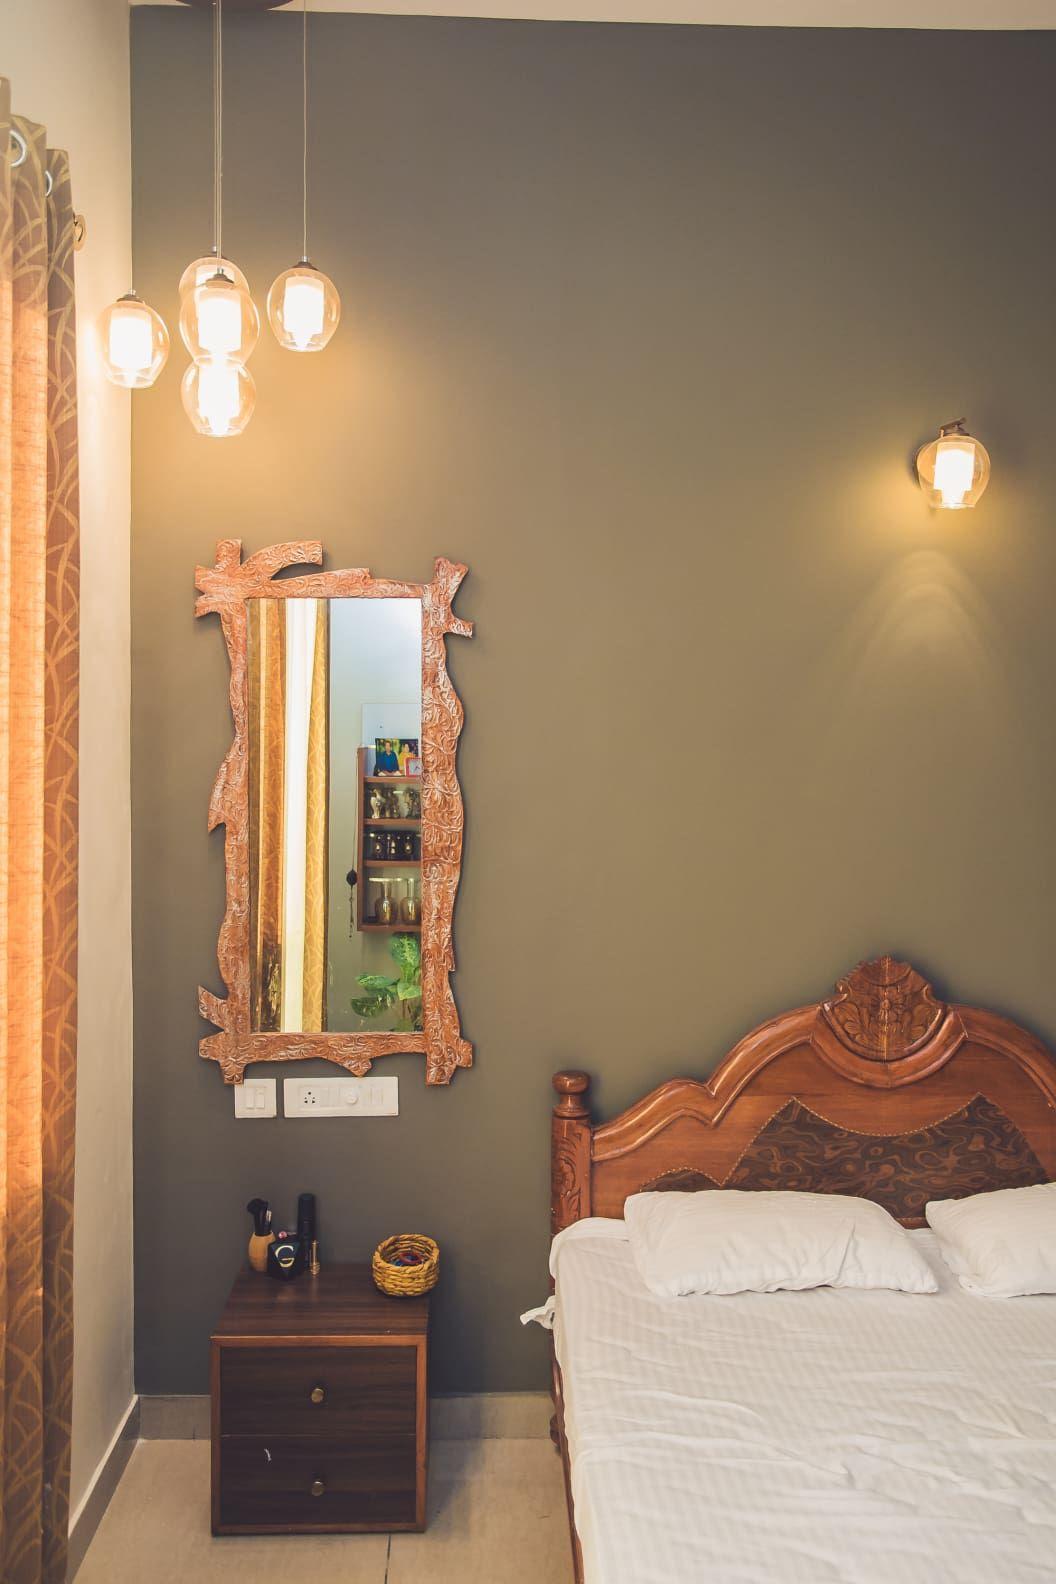 6 Unique Bedroom Wall Paint Colours That Work For Indian Homes Bedroom Wall Paint Bedroom Wall Paint Colors Bedroom Wall Colors